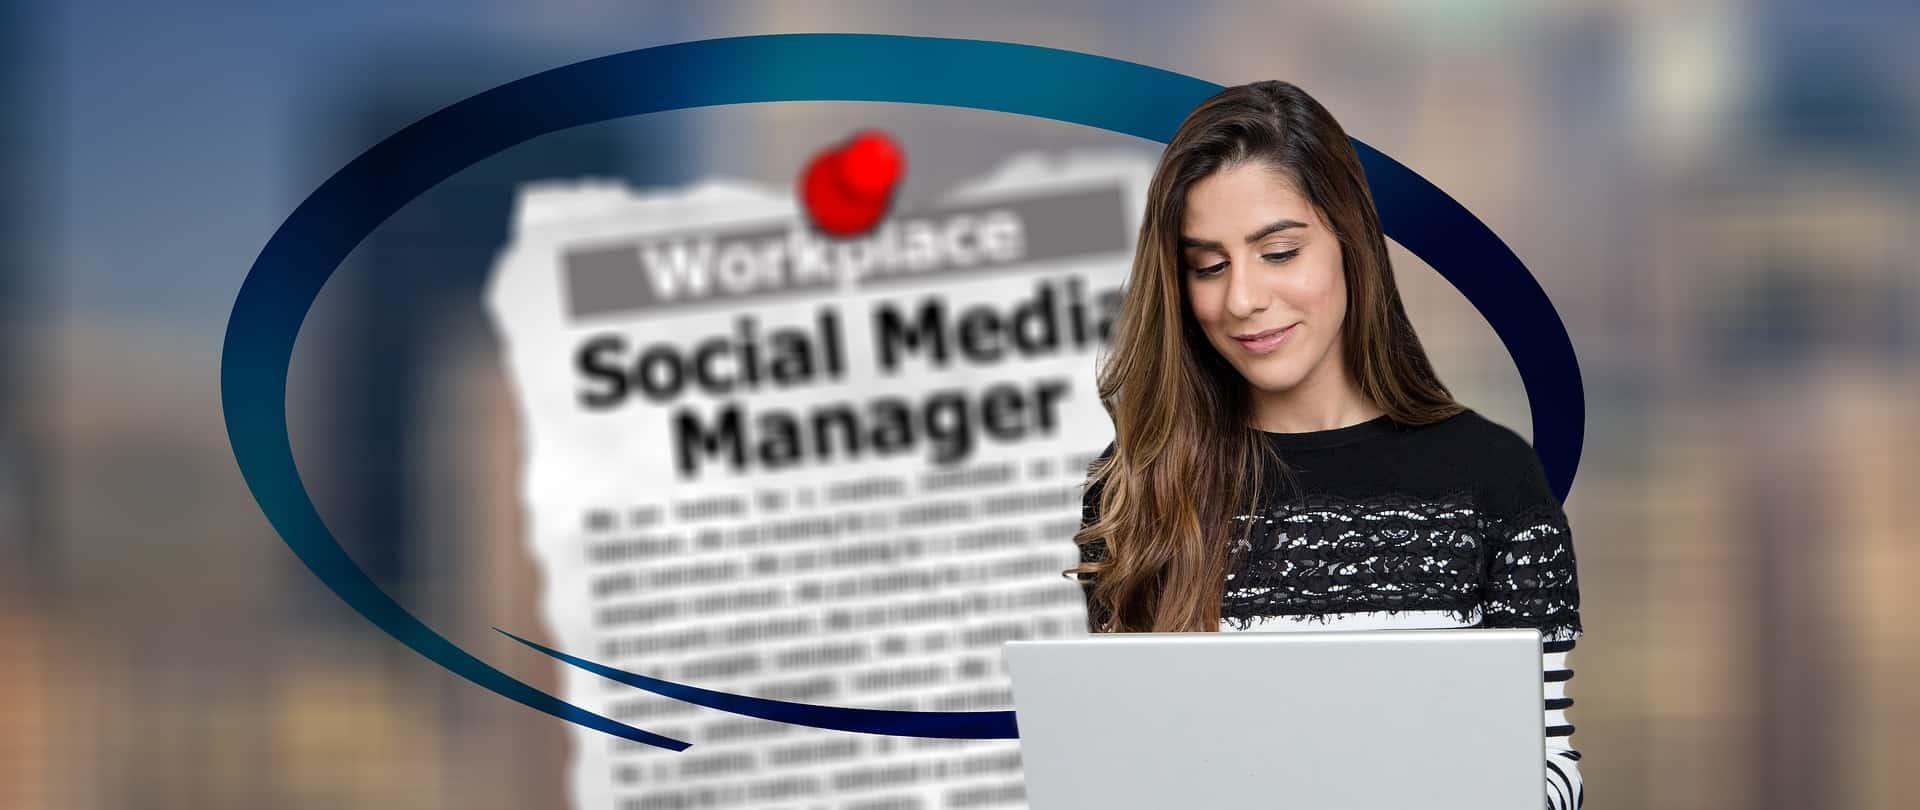 Social Media Work at Home